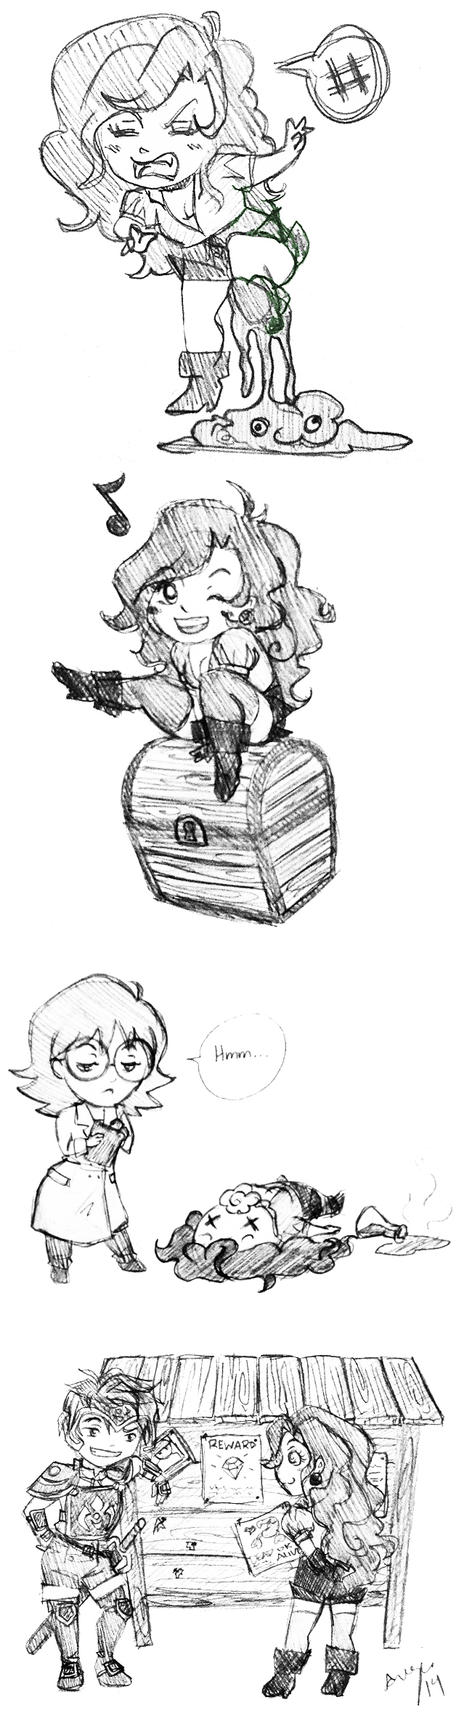 Infinity Tower Sketch Dump by Rainbow-Grenade